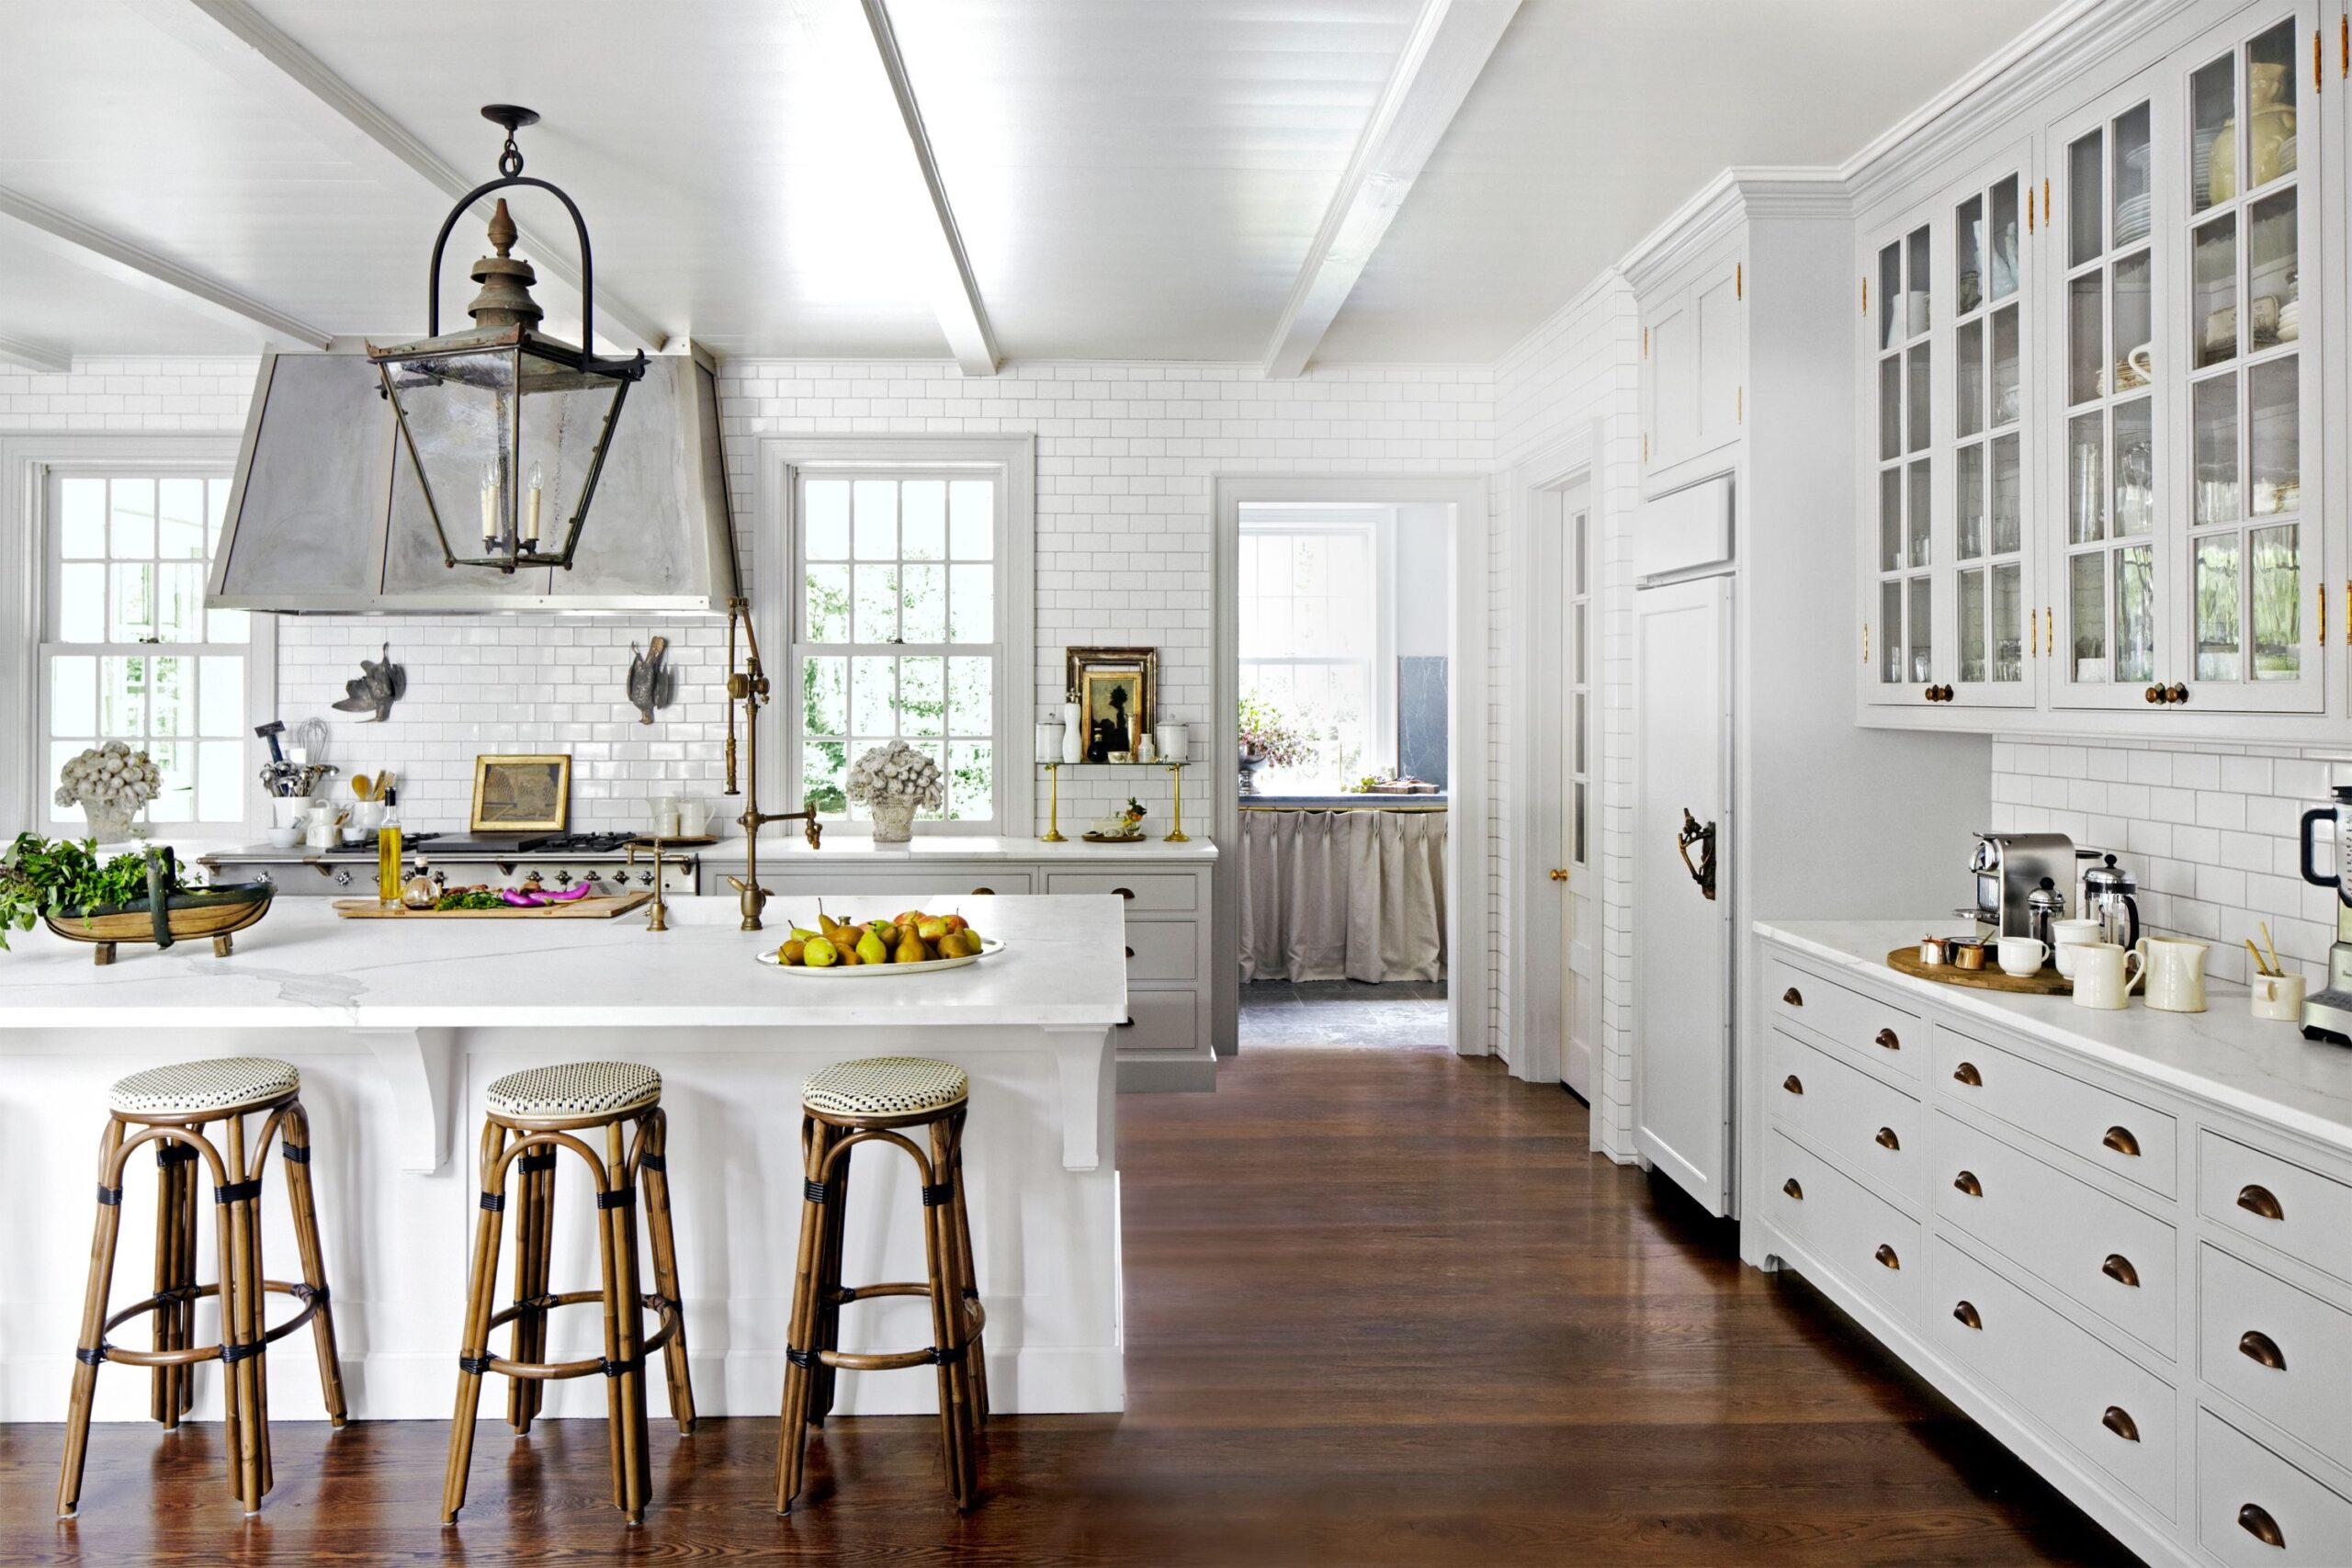 Desain Dapur Interior Putih - Thegorbalsla